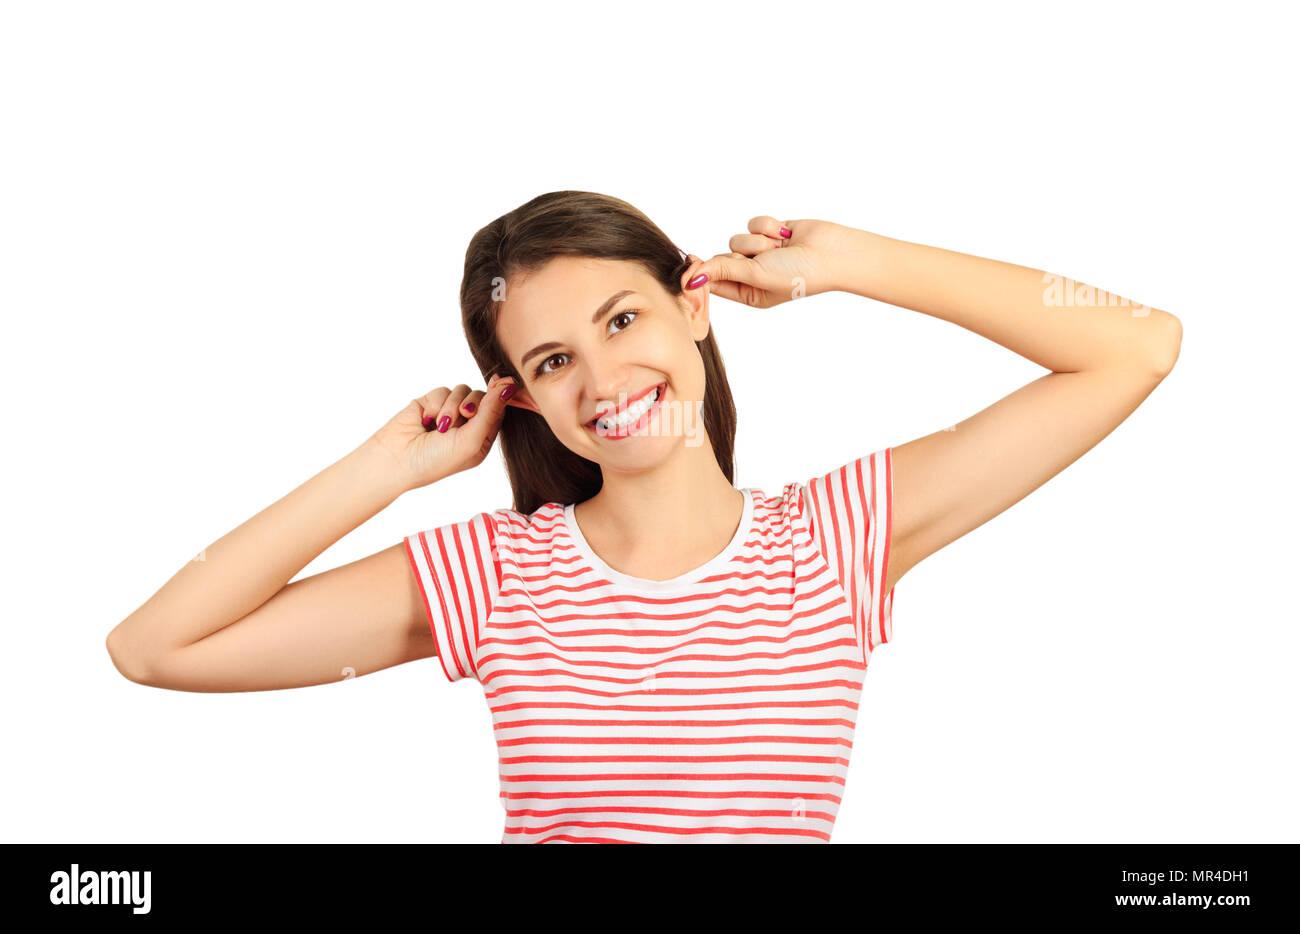 emotional girl playing posing at the camera. emotional girl isolated on white background. - Stock Image